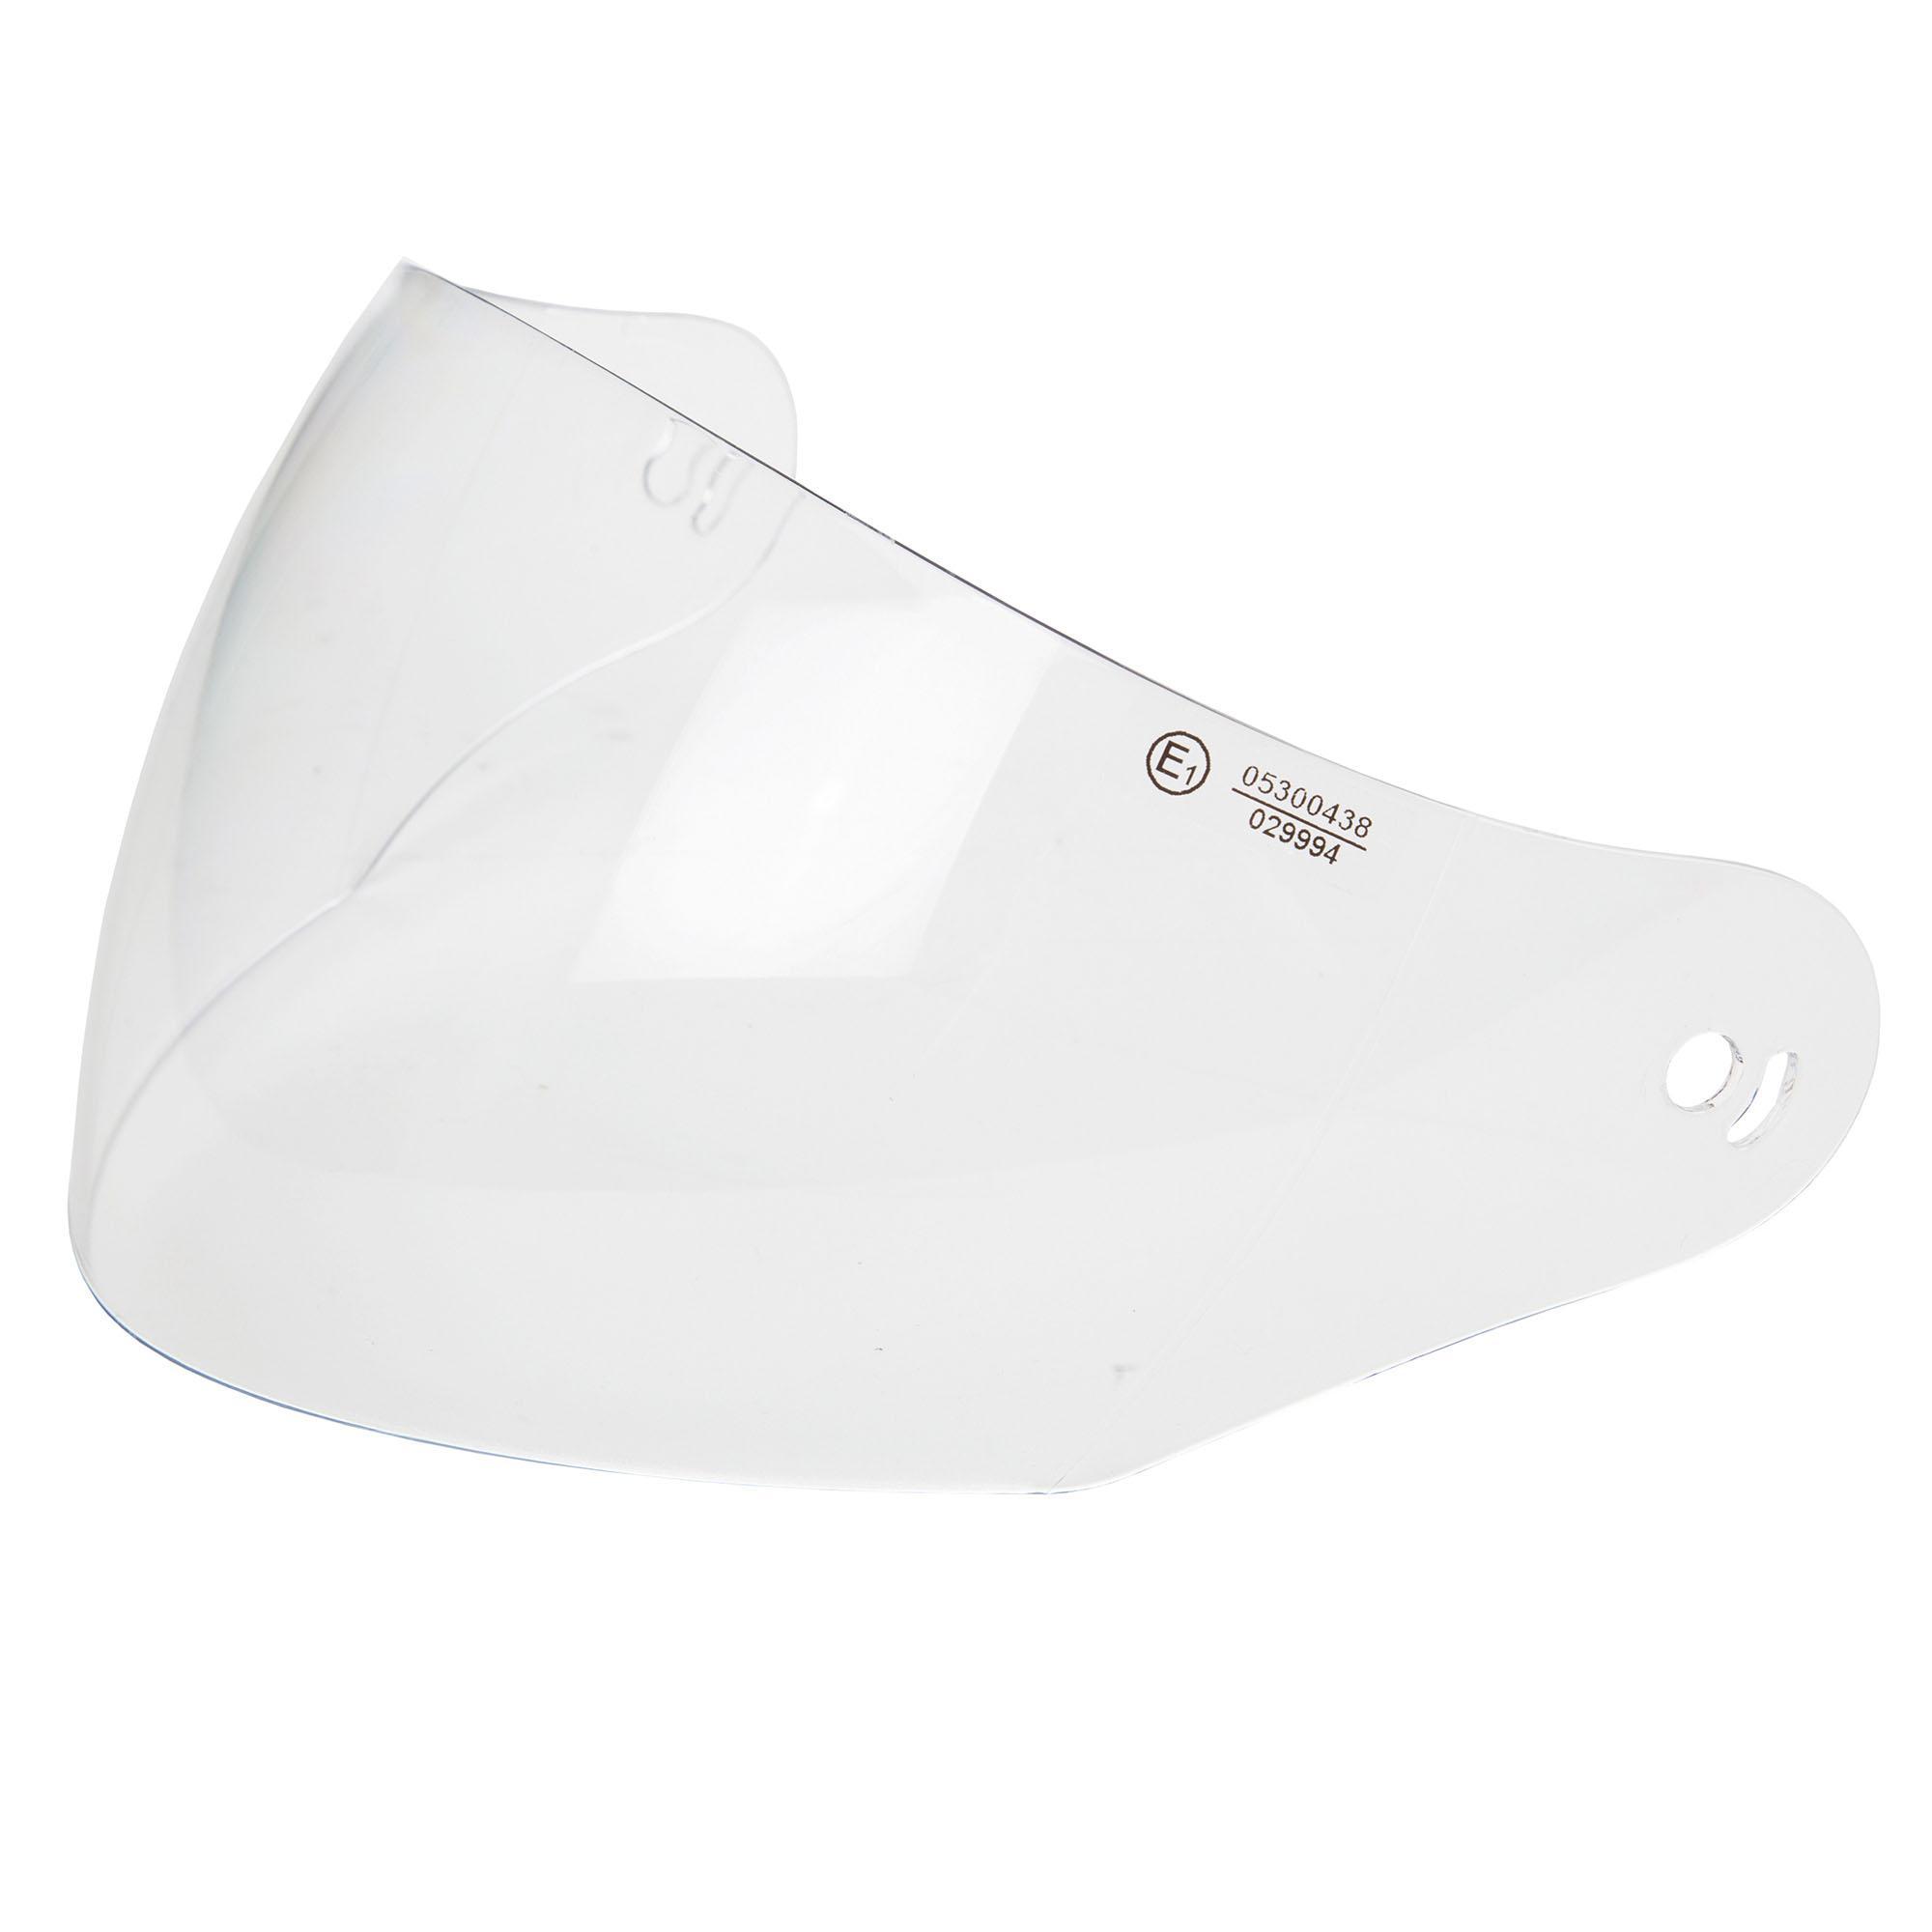 Longtransparentvisor El'mettin Helmet/el'jettin Helmet Transparent